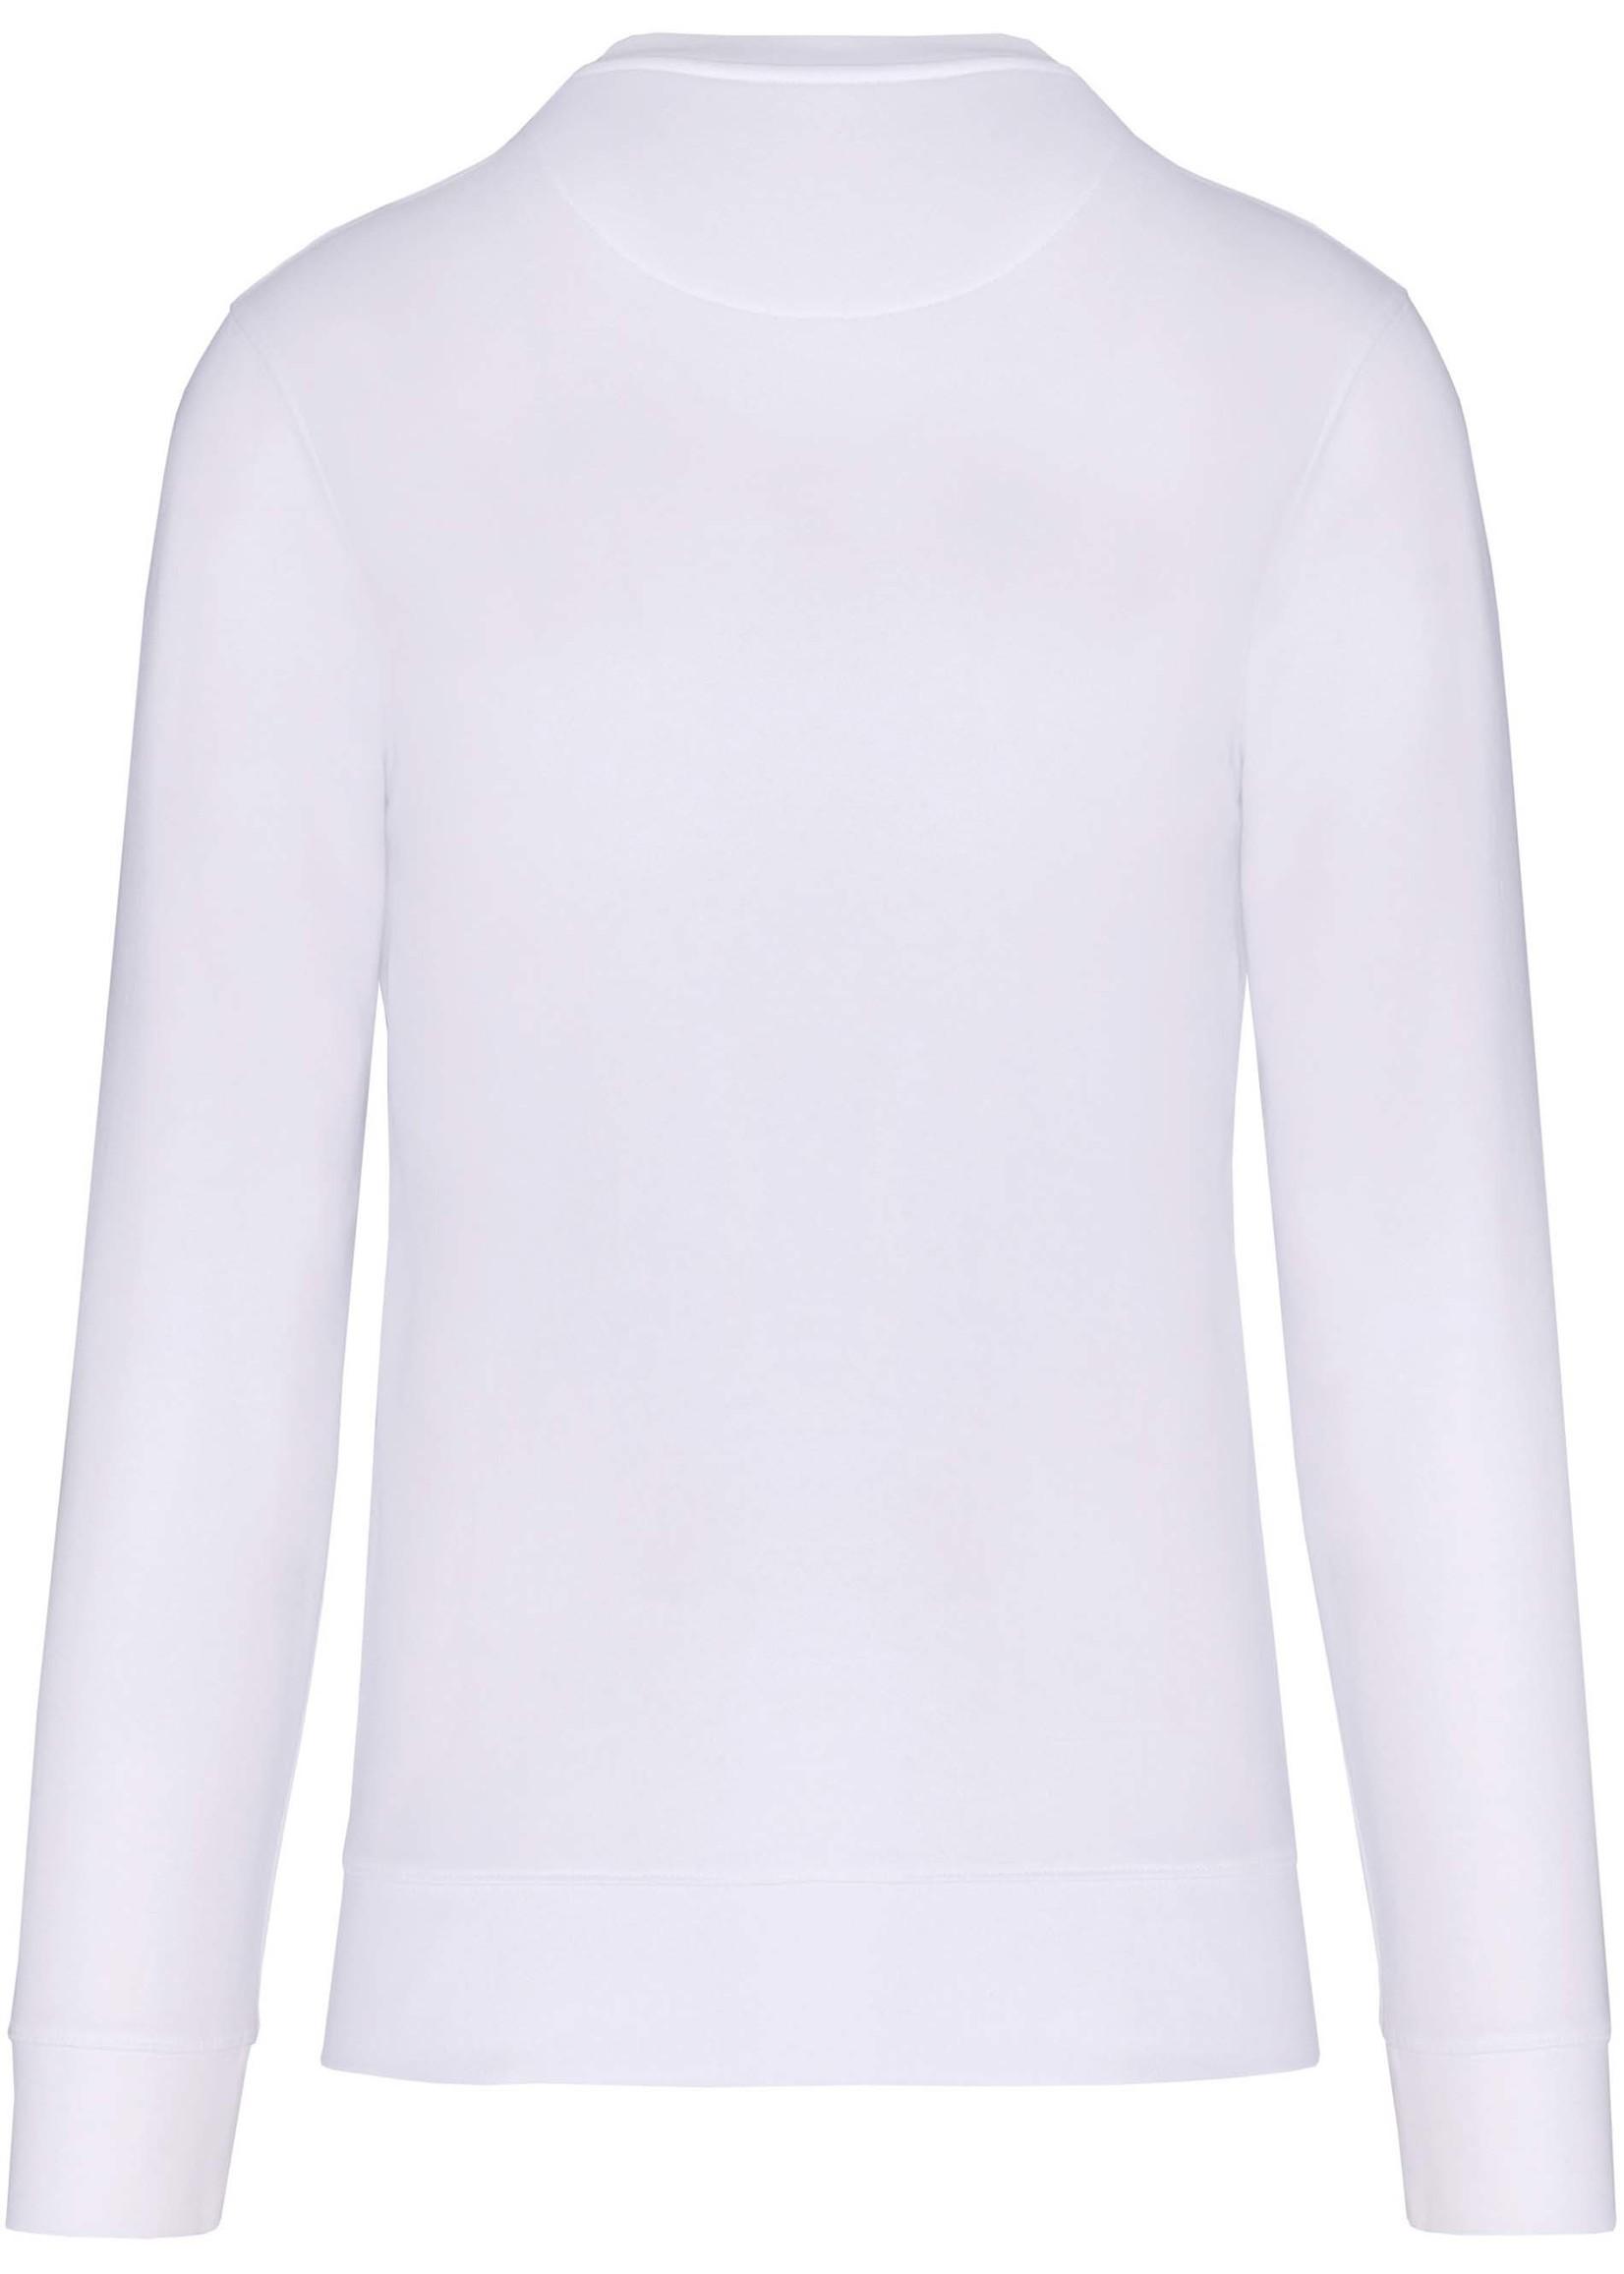 Eco-Friendly Crew Neck Sweater Kids-White